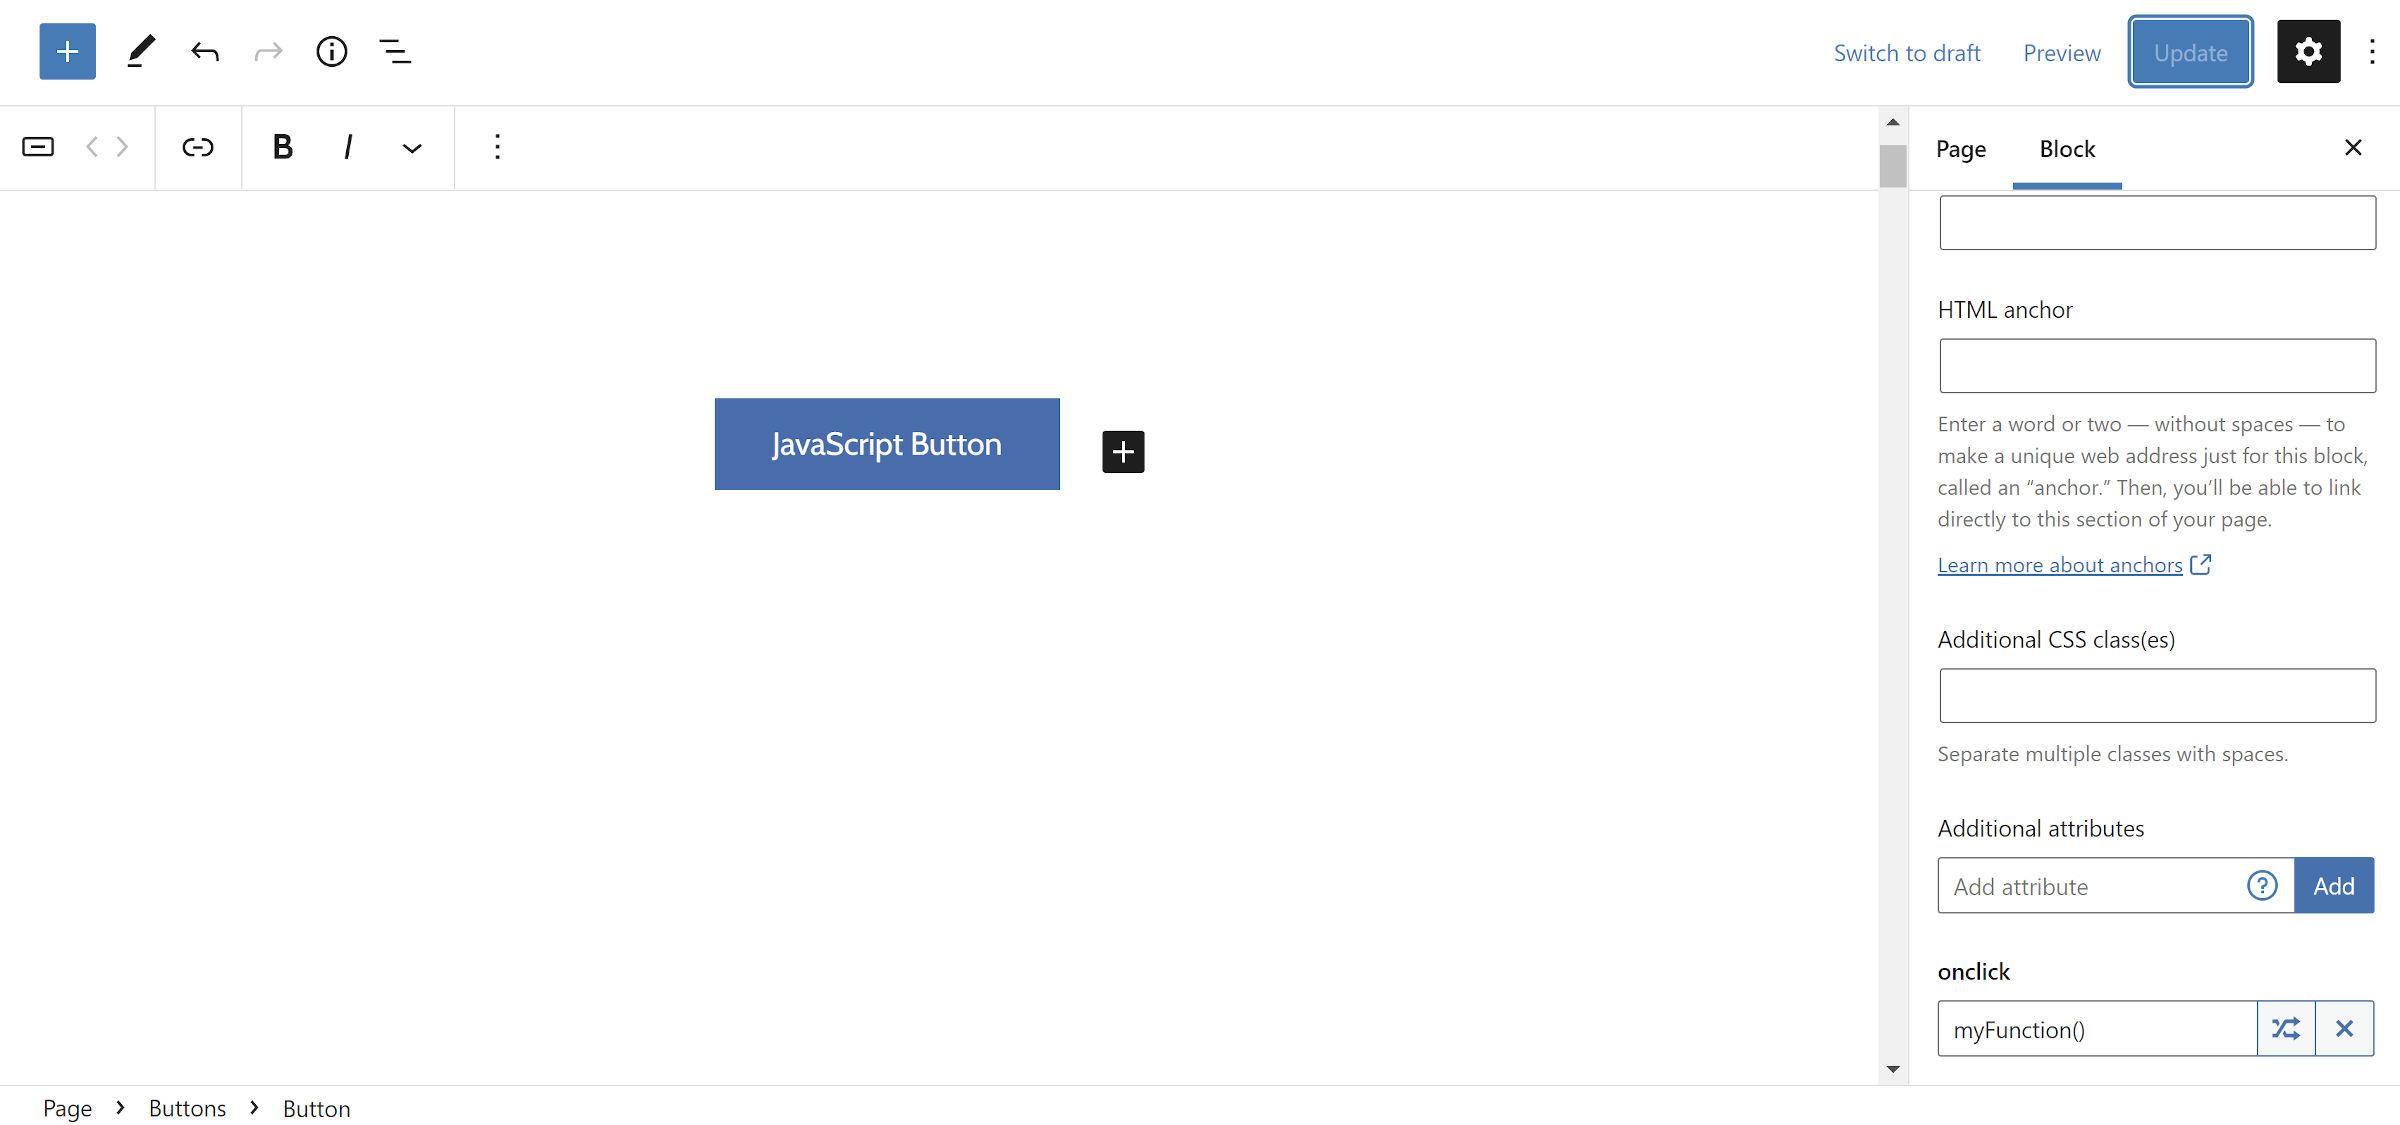 Adding a custom attribute for JavaScript handling to a Button block in the WordPress editor via the Block Attributes plugin panel.